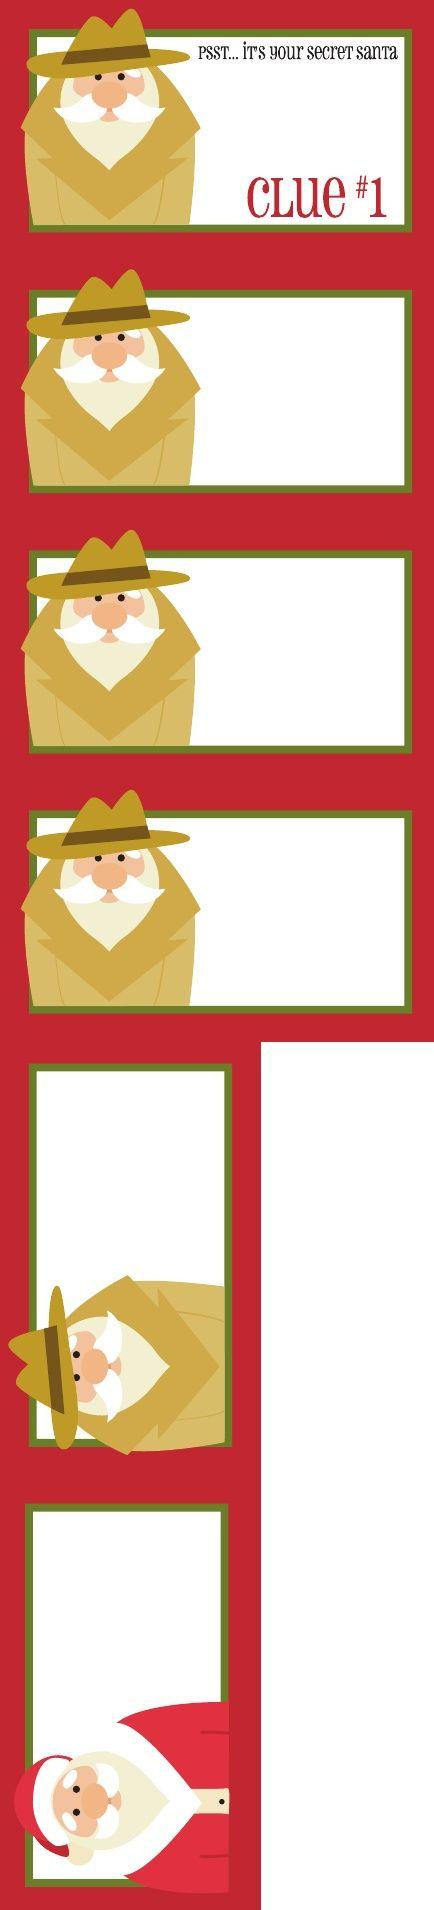 7 best images of secret santa gift tags free printable for Secret santa craft ideas